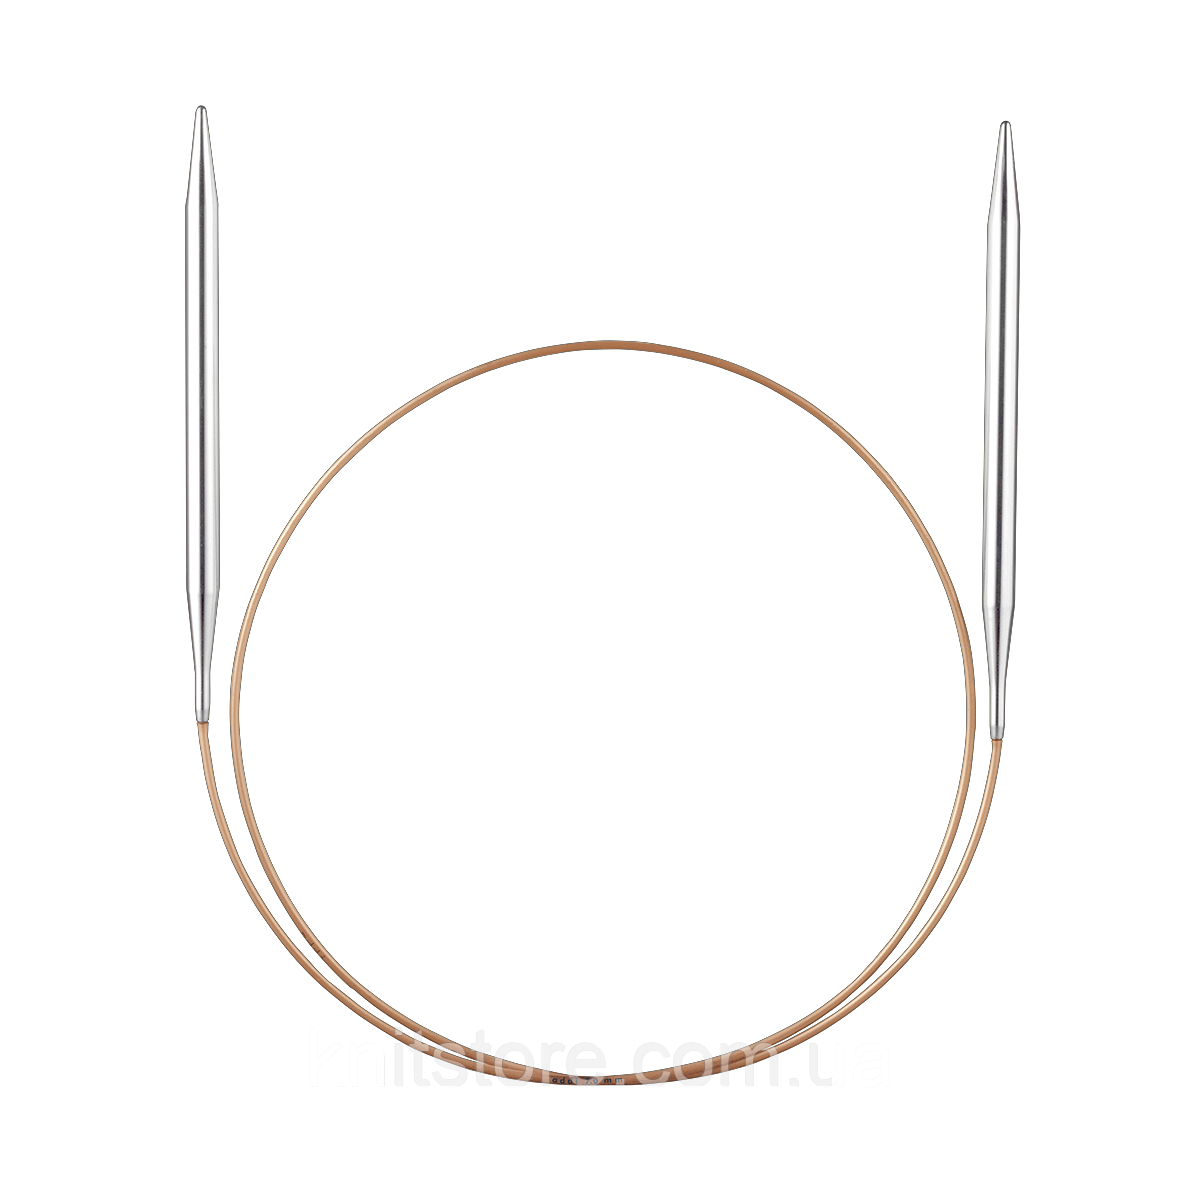 Спицы Addi   круговые   40 см   3.5 мм